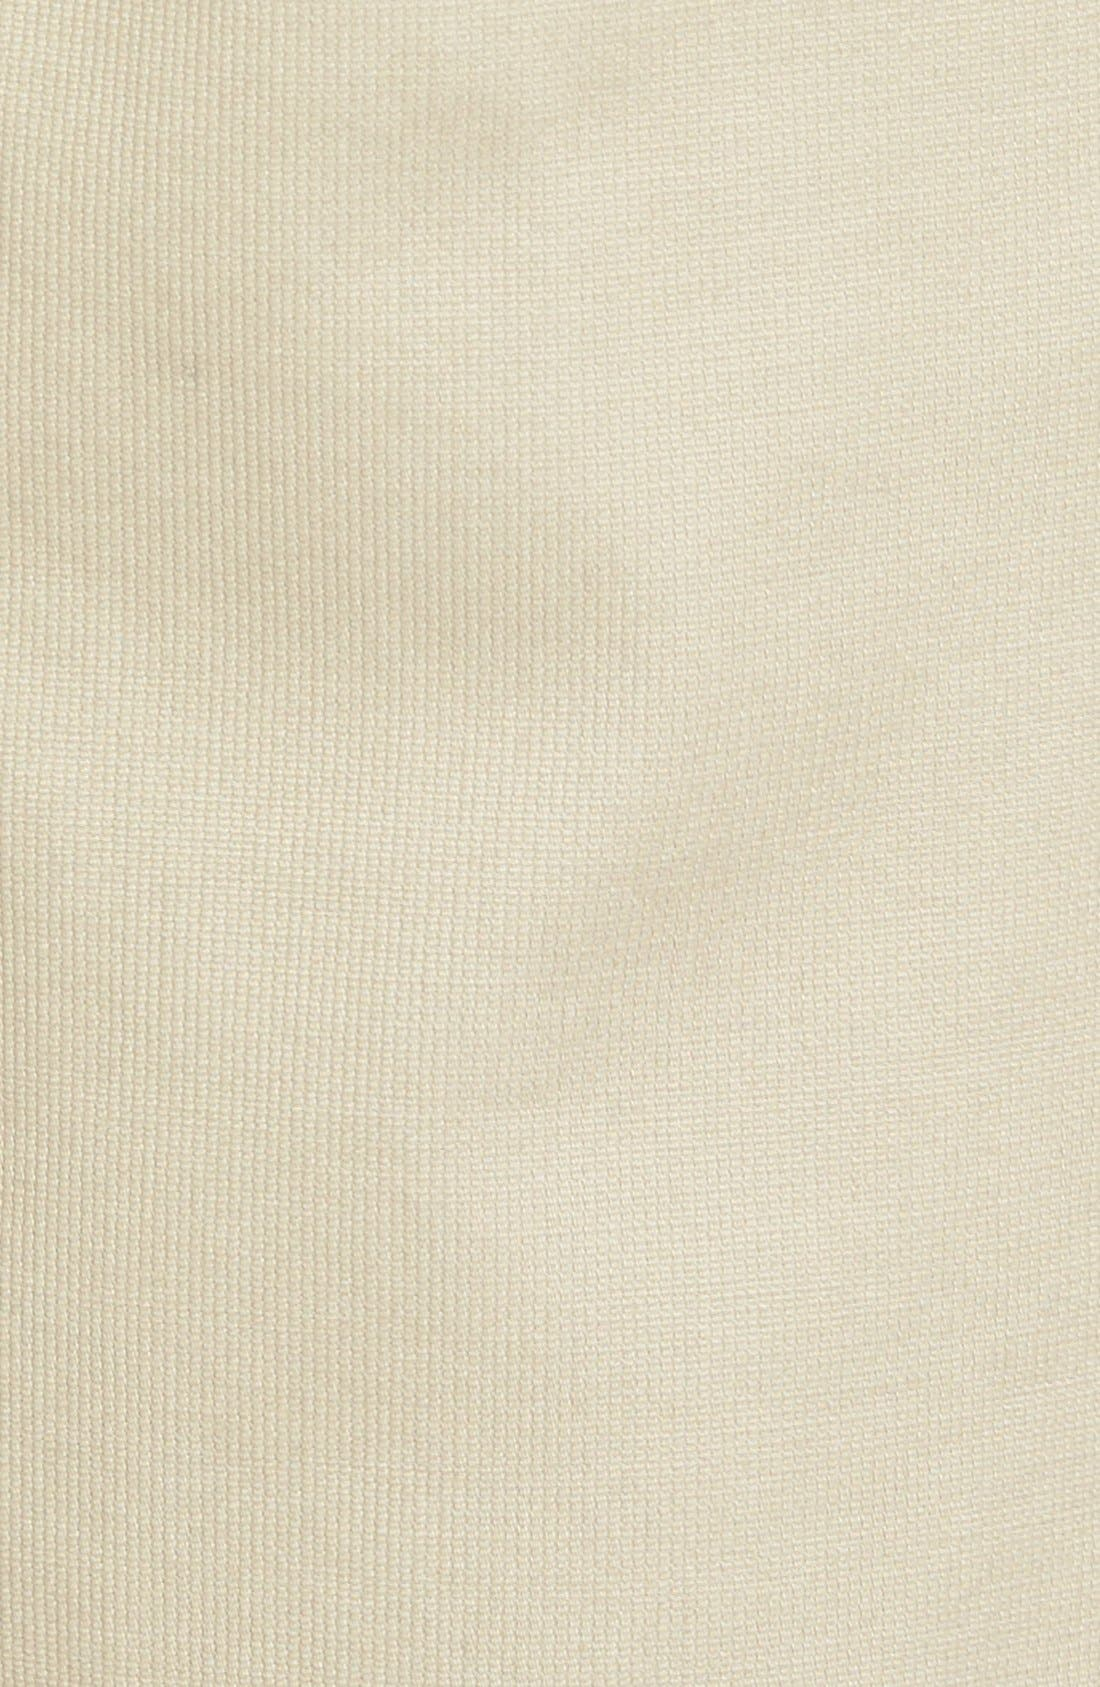 'Bedford & Sons' Shorts,                             Alternate thumbnail 25, color,